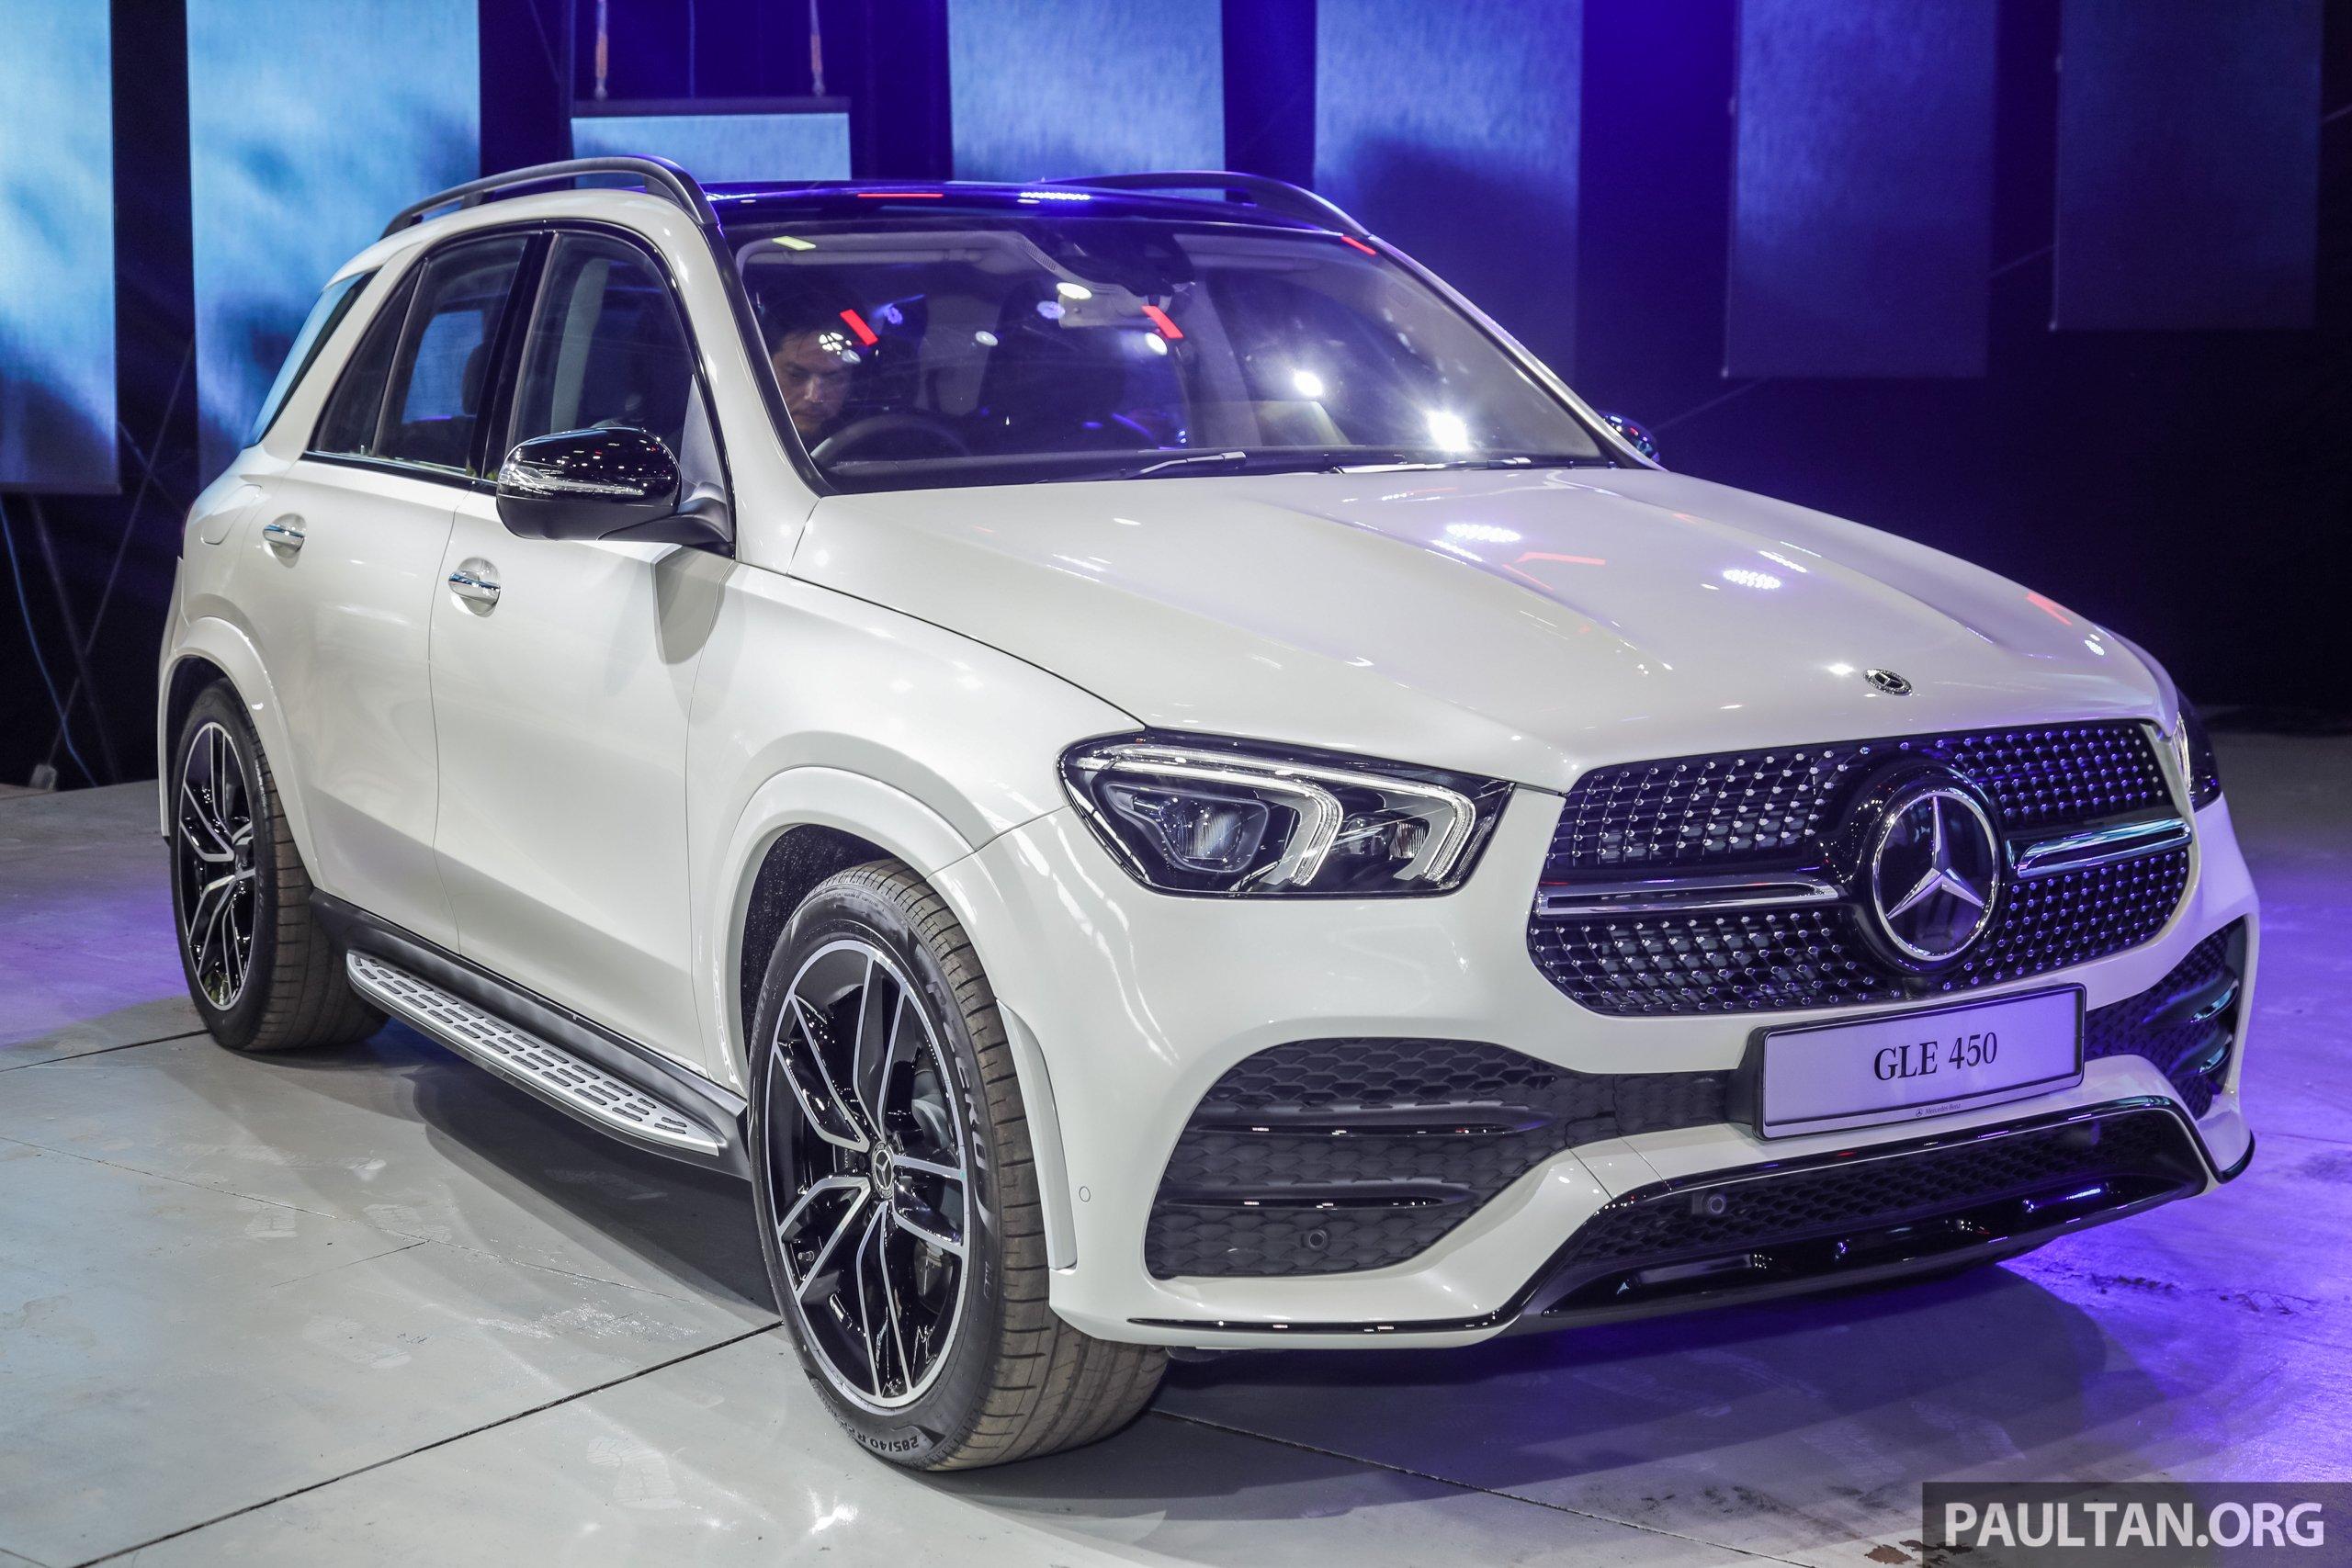 V167 Mercedes Benz Gle450 Previewed Rm634k Est Paultan Org